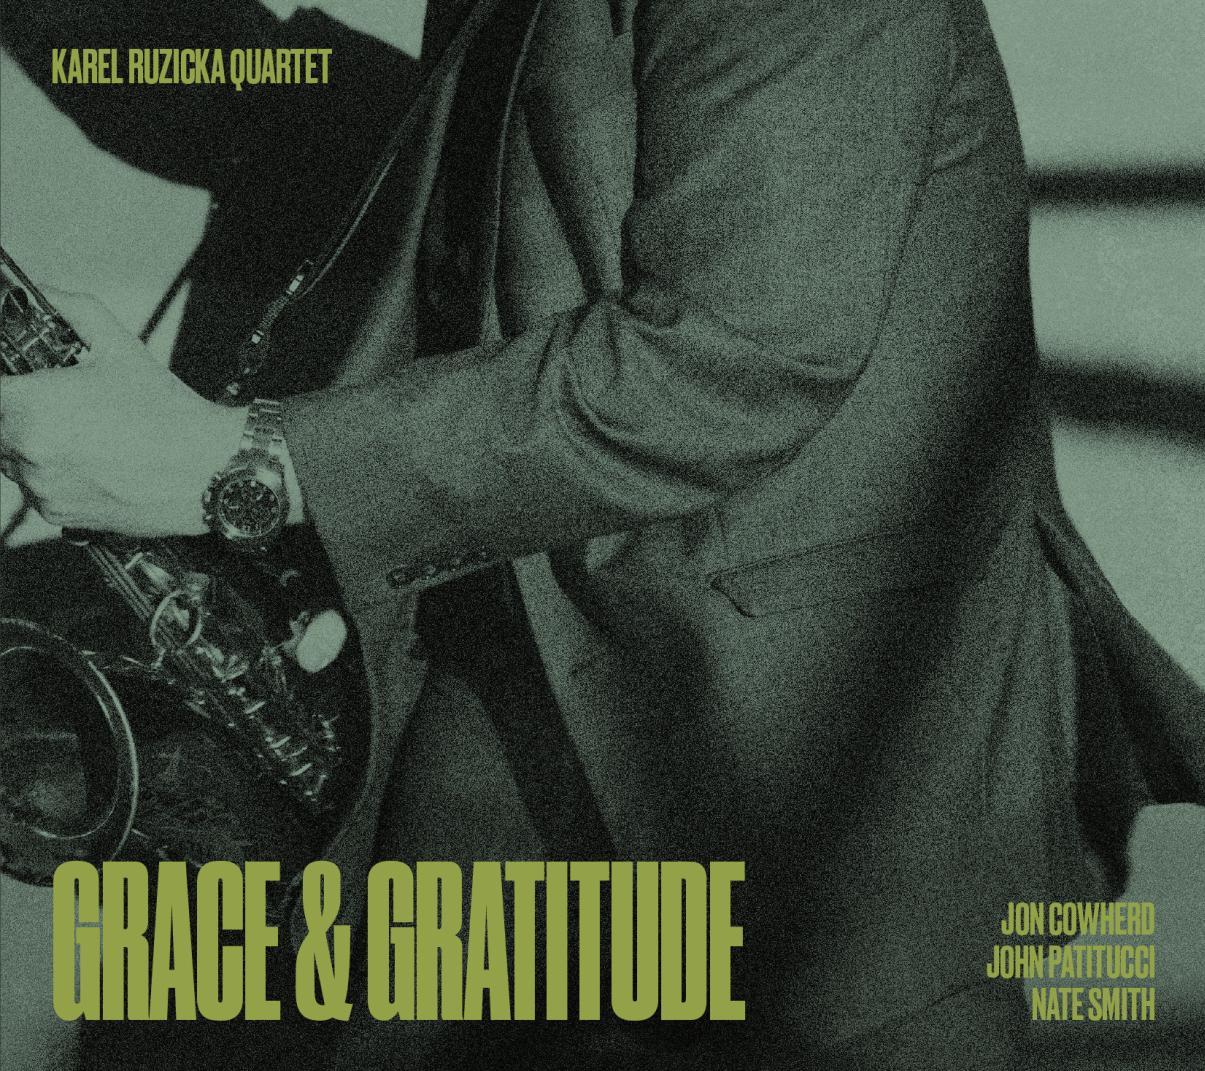 Karel Růžička Quartet: Grace & Gratitude